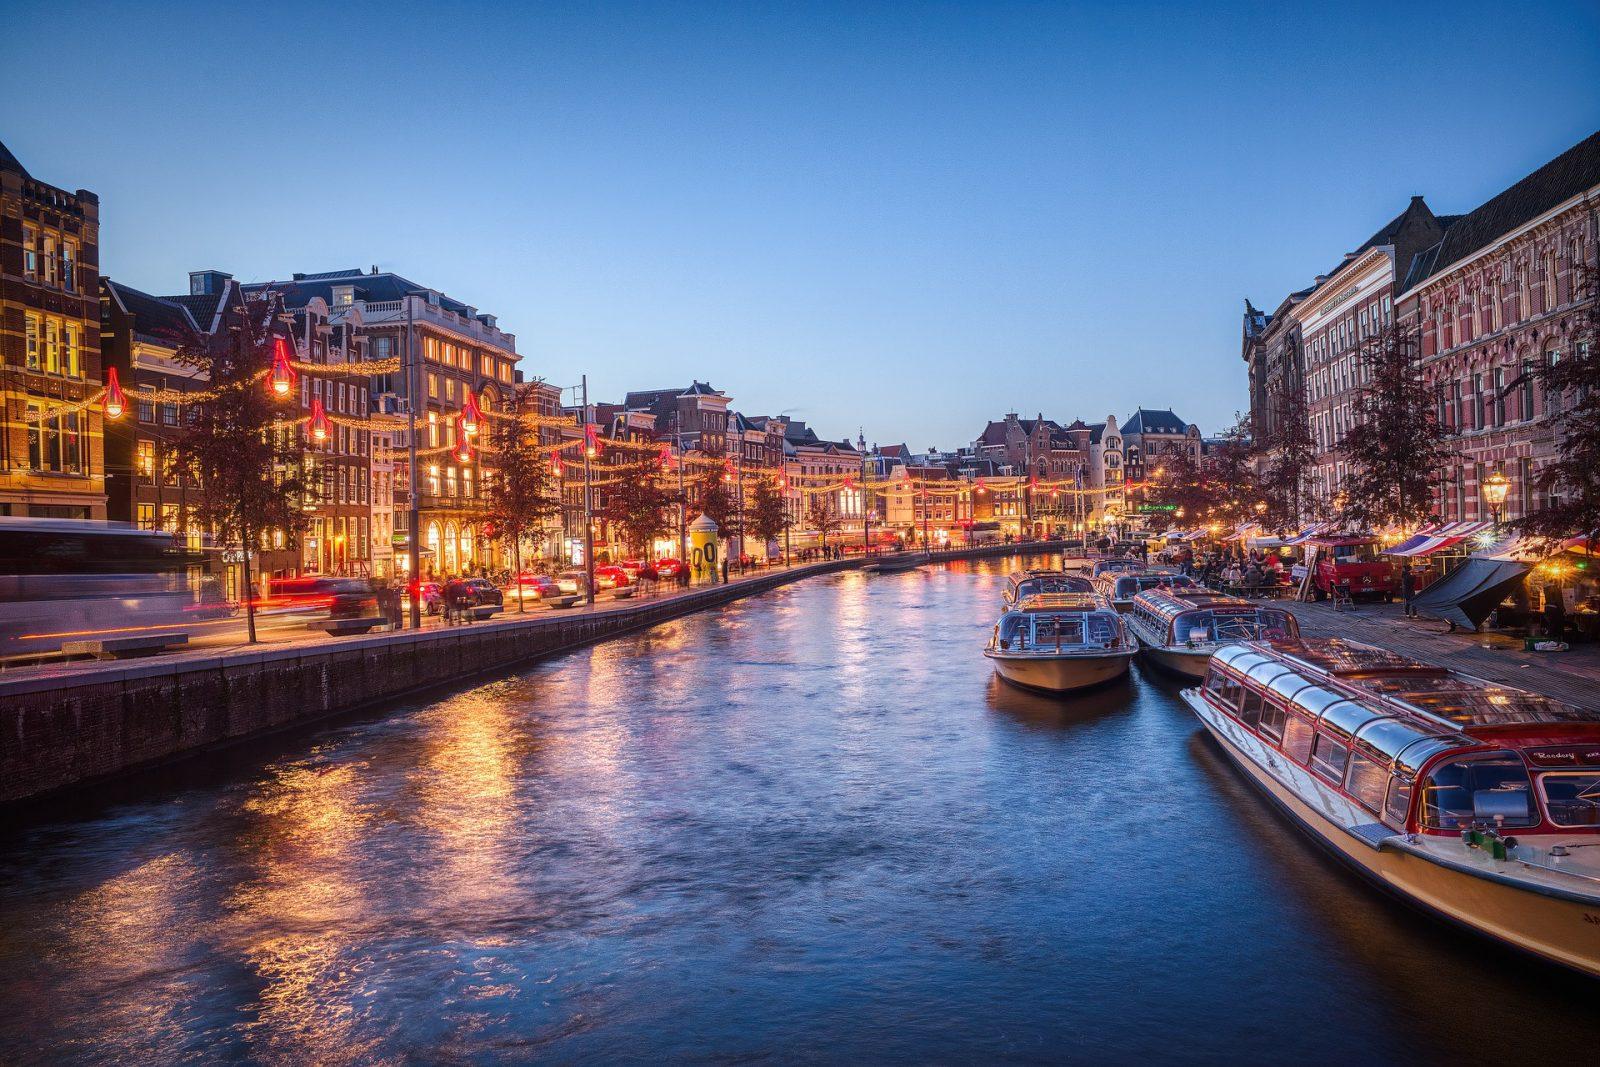 Evropski gradovi, Evropska putovanja, Evropske metropole, Amsterdam